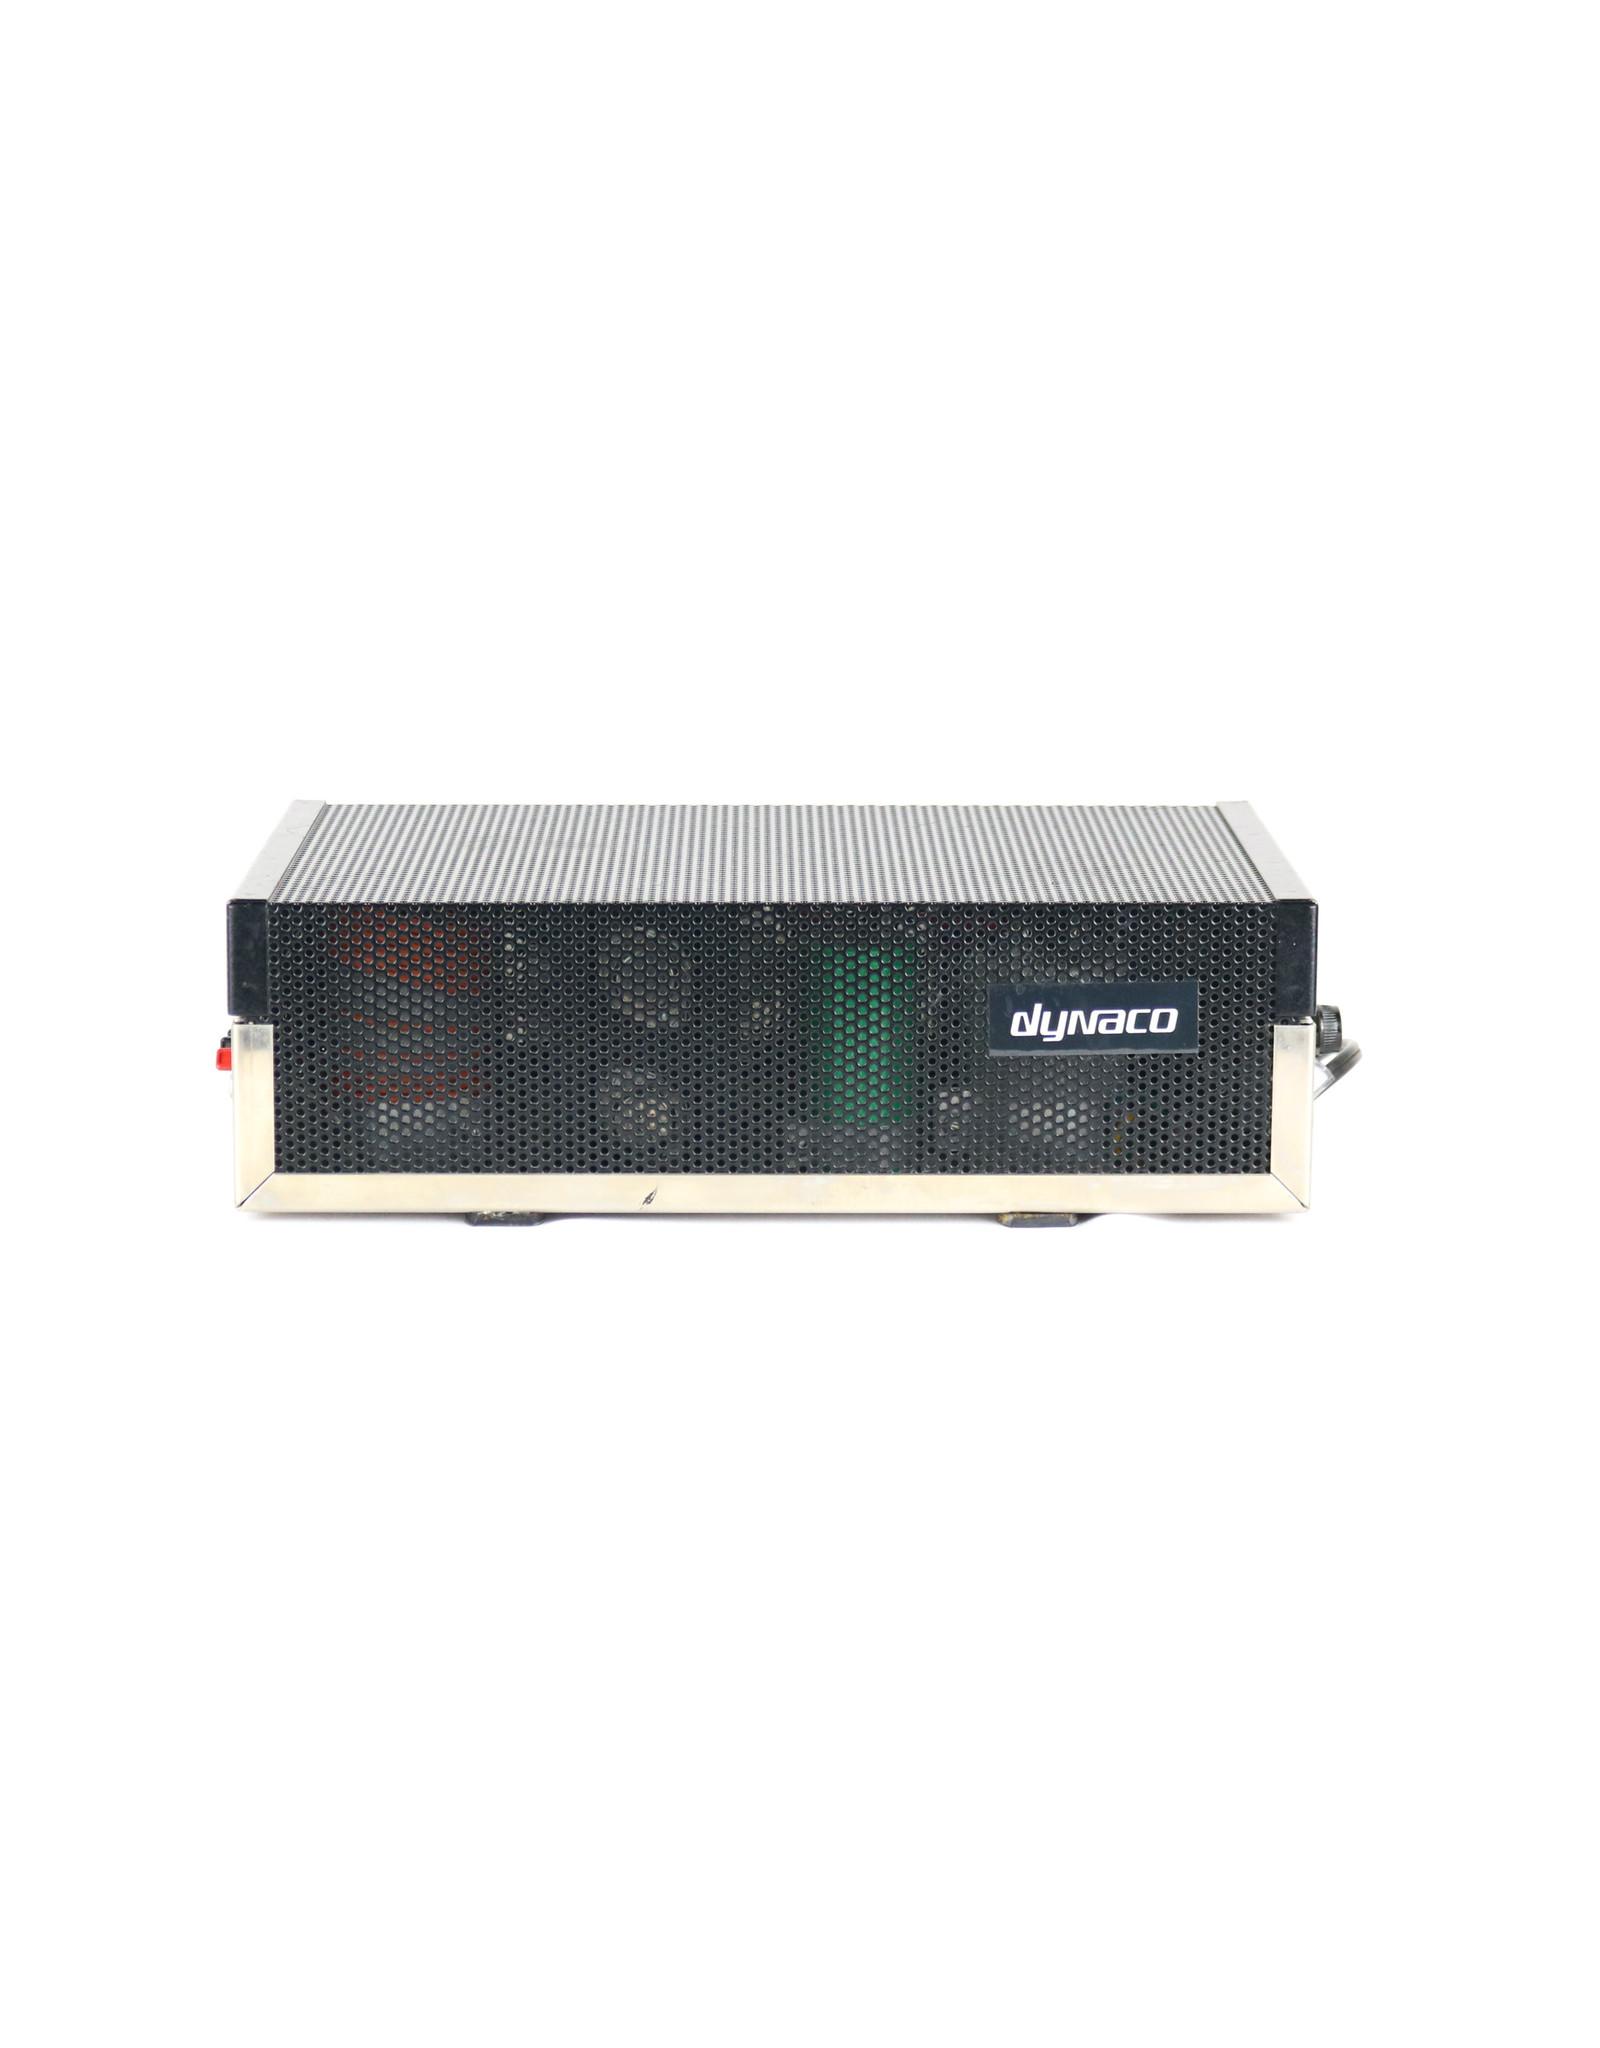 Dynaco Dynaco ST-80 Power Amp USED